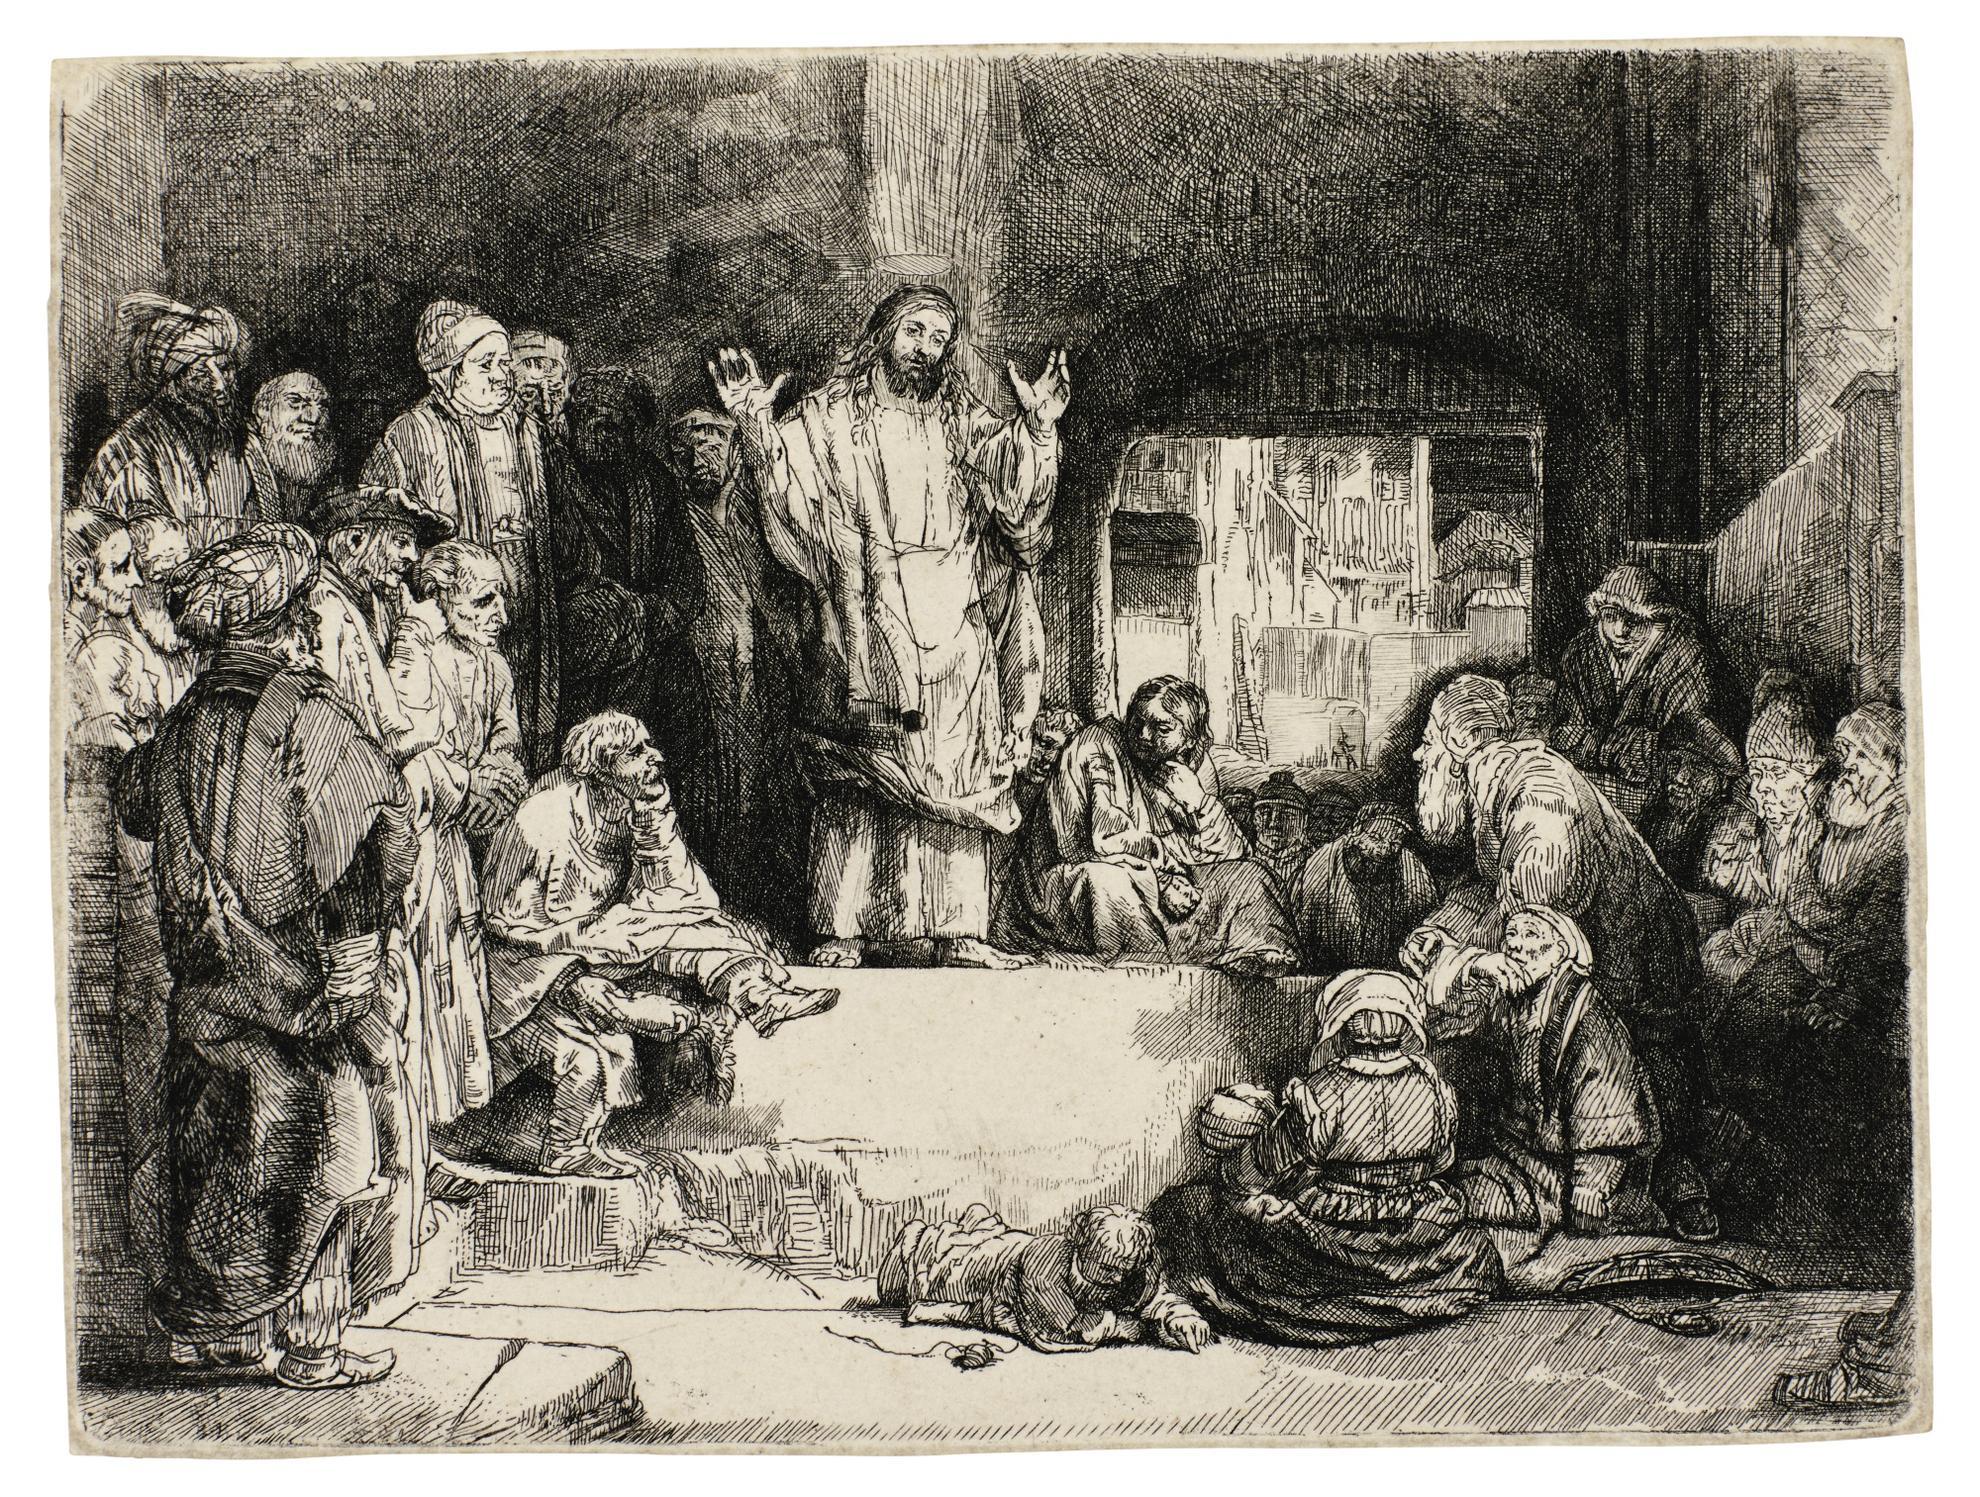 Rembrandt van Rijn-Christ Preaching (La Petite Tombe) (B., Holl. 67; New Holl. 298; H. 256)-1657